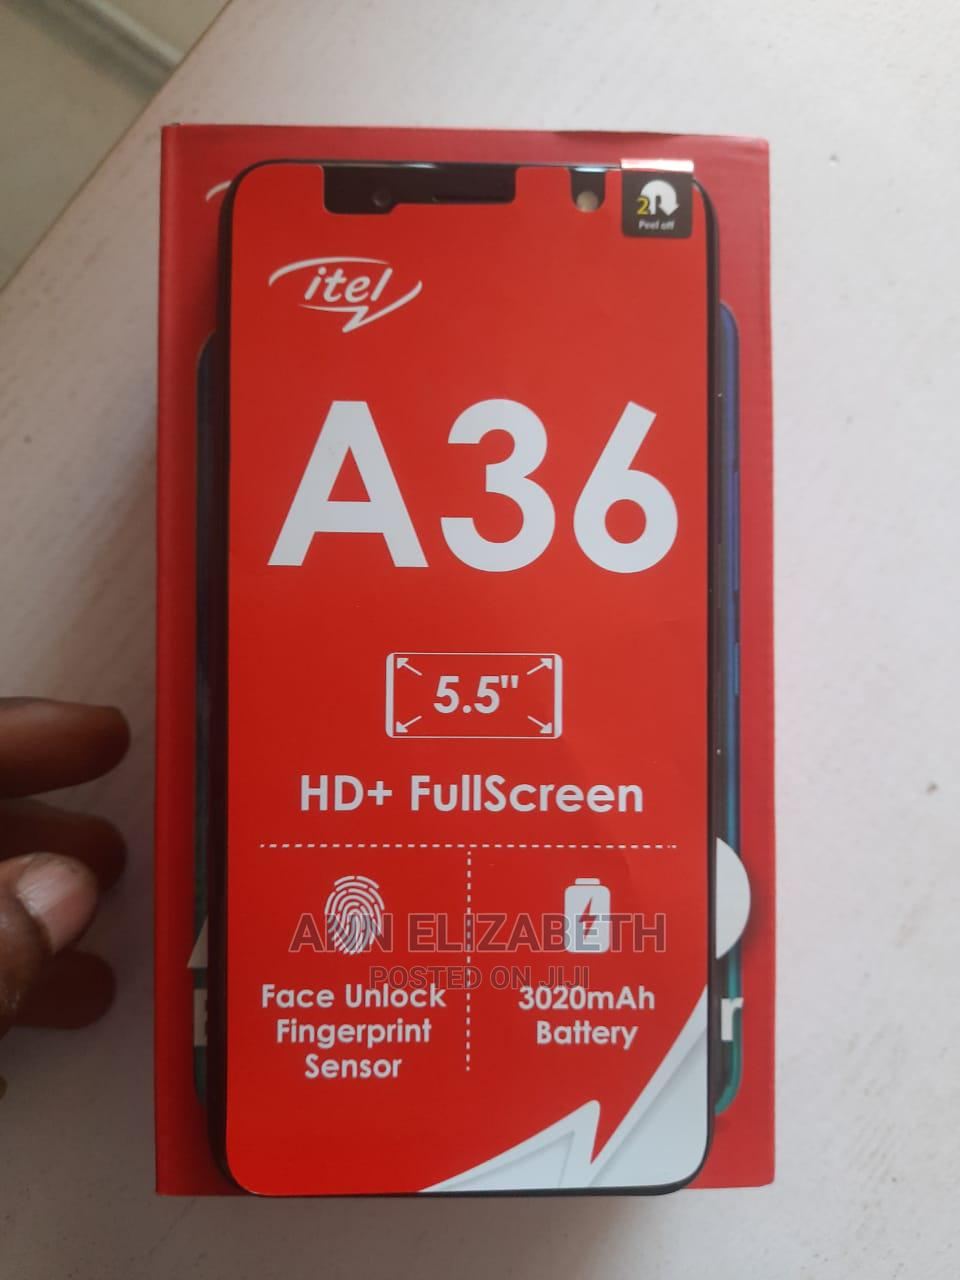 Archive: New Itel A36 16GB Blue